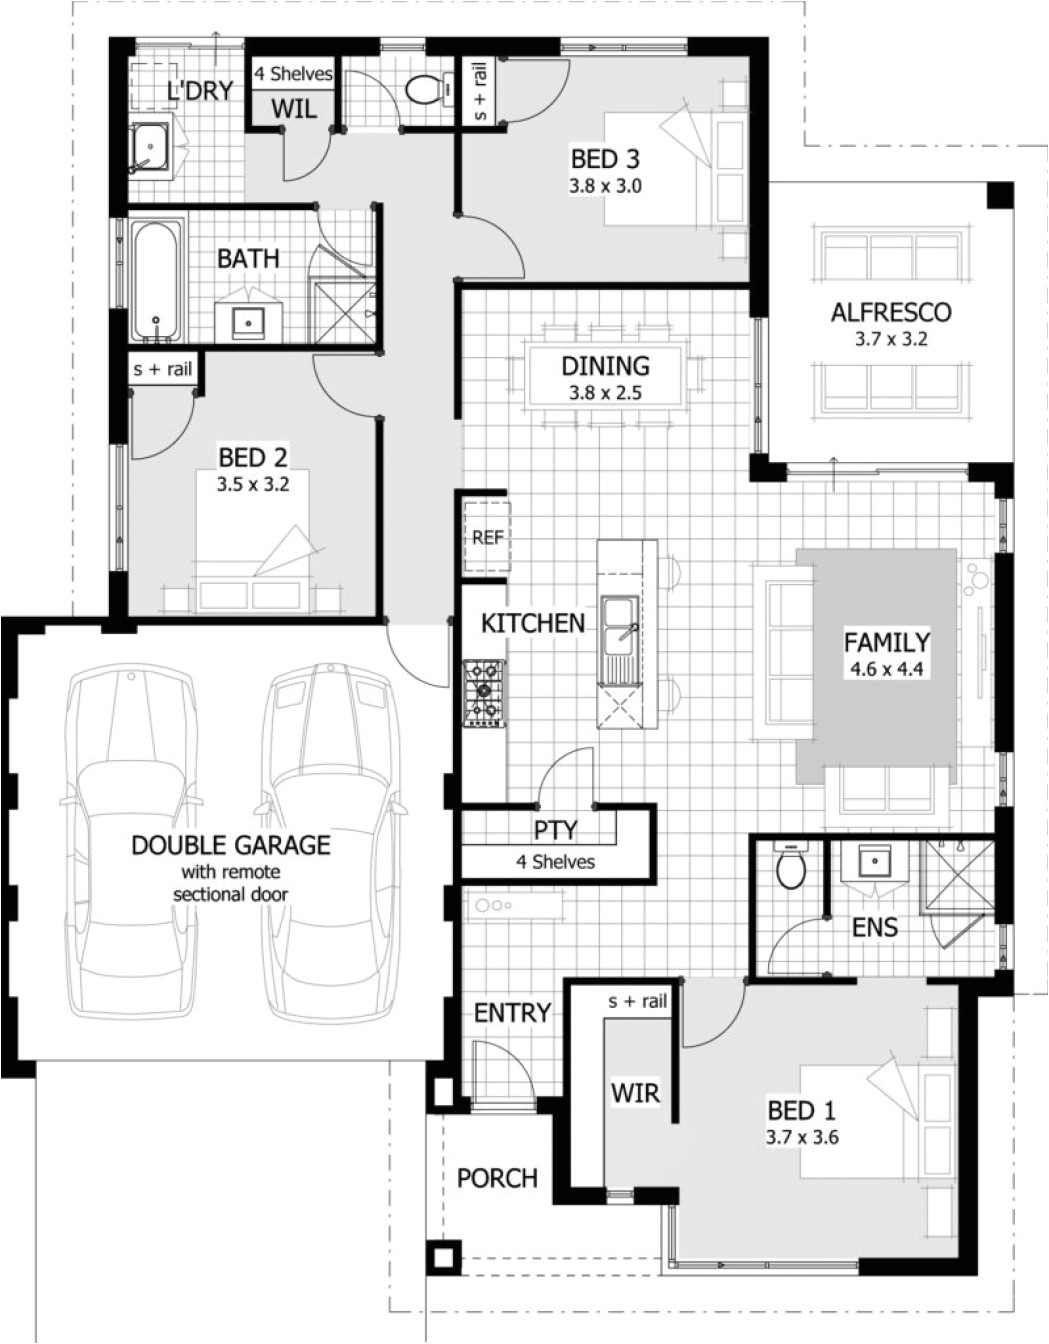 interior design 15 3 bedroom house floor plans interior 42c6a26327e3ce12